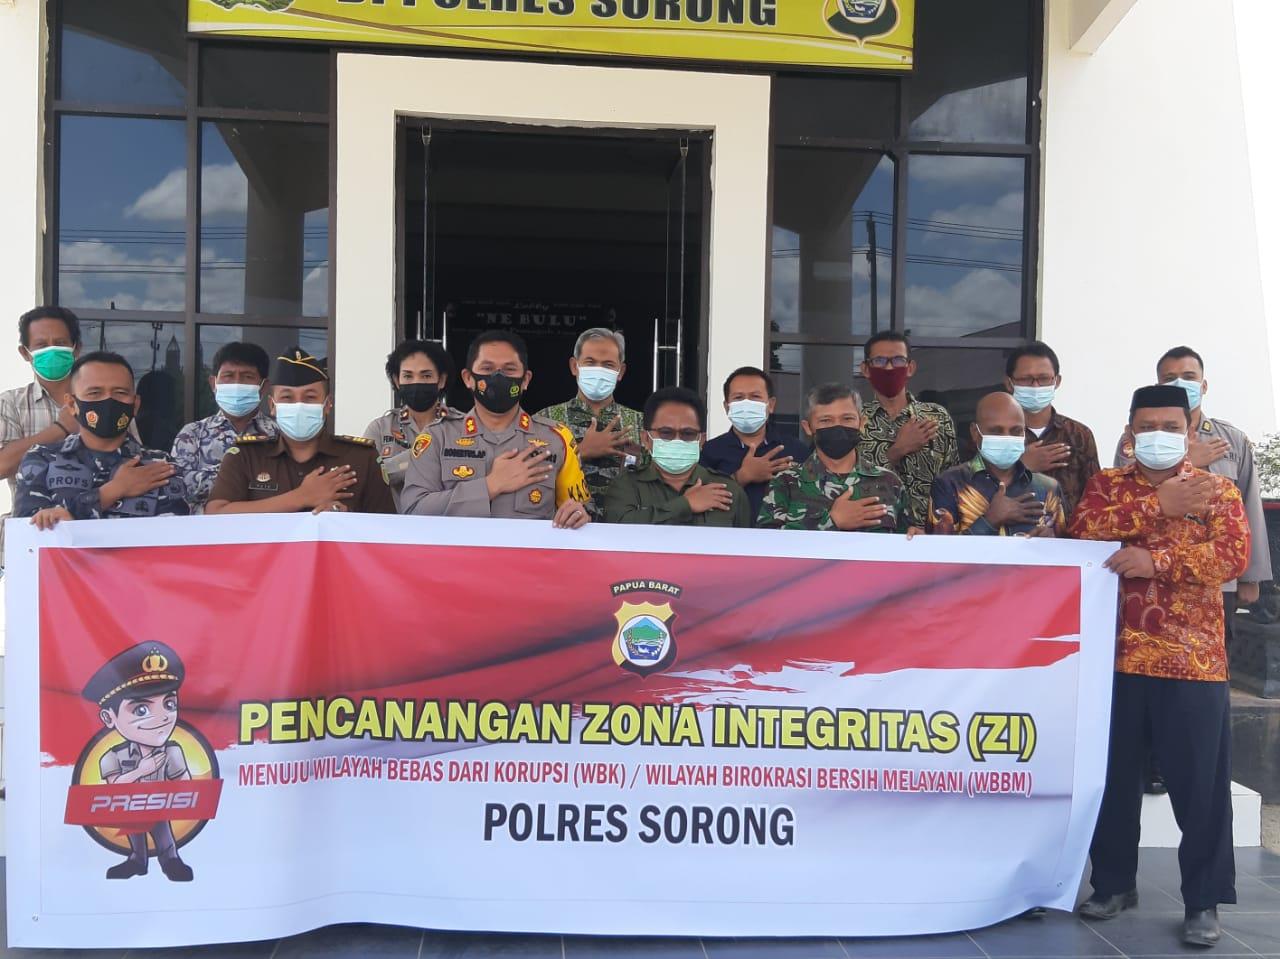 Polres Sorong Gelar Kegiatan Deklarasi Pencanangan Zona Integritas (ZI) Menuju Wilayah Bebas Korupsi (WBK)